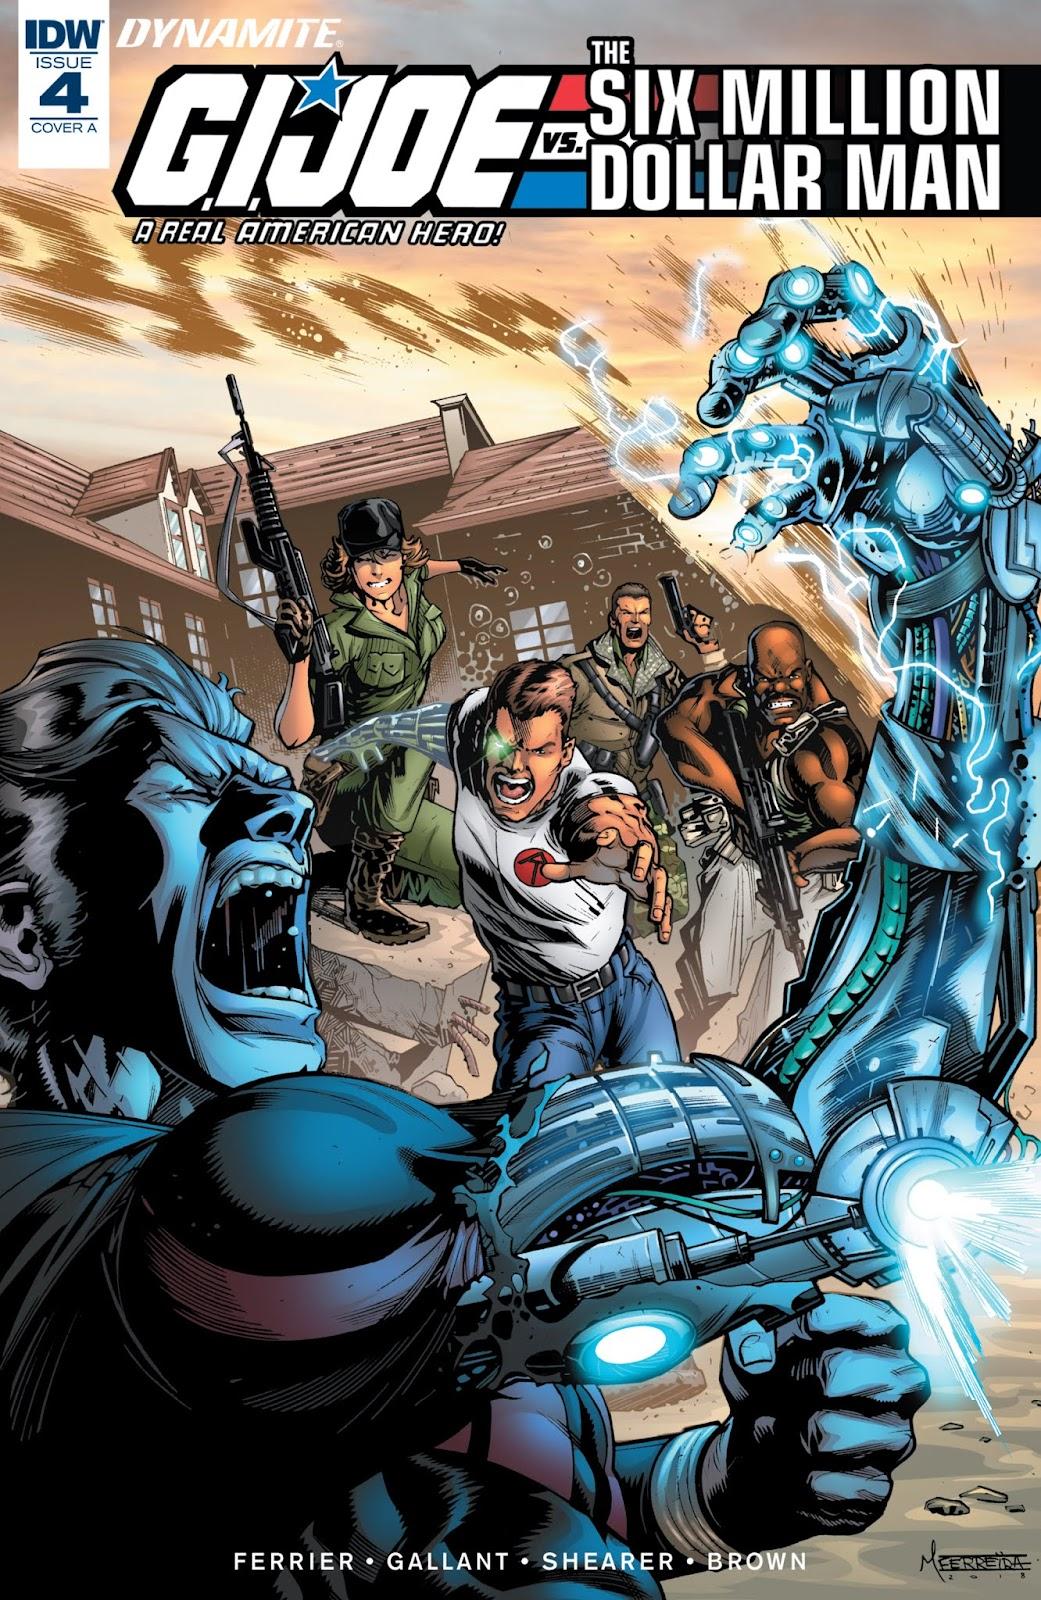 G.I. Joe: A Real American Hero vs. the Six Million Dollar Man  issue 4 - Page 1